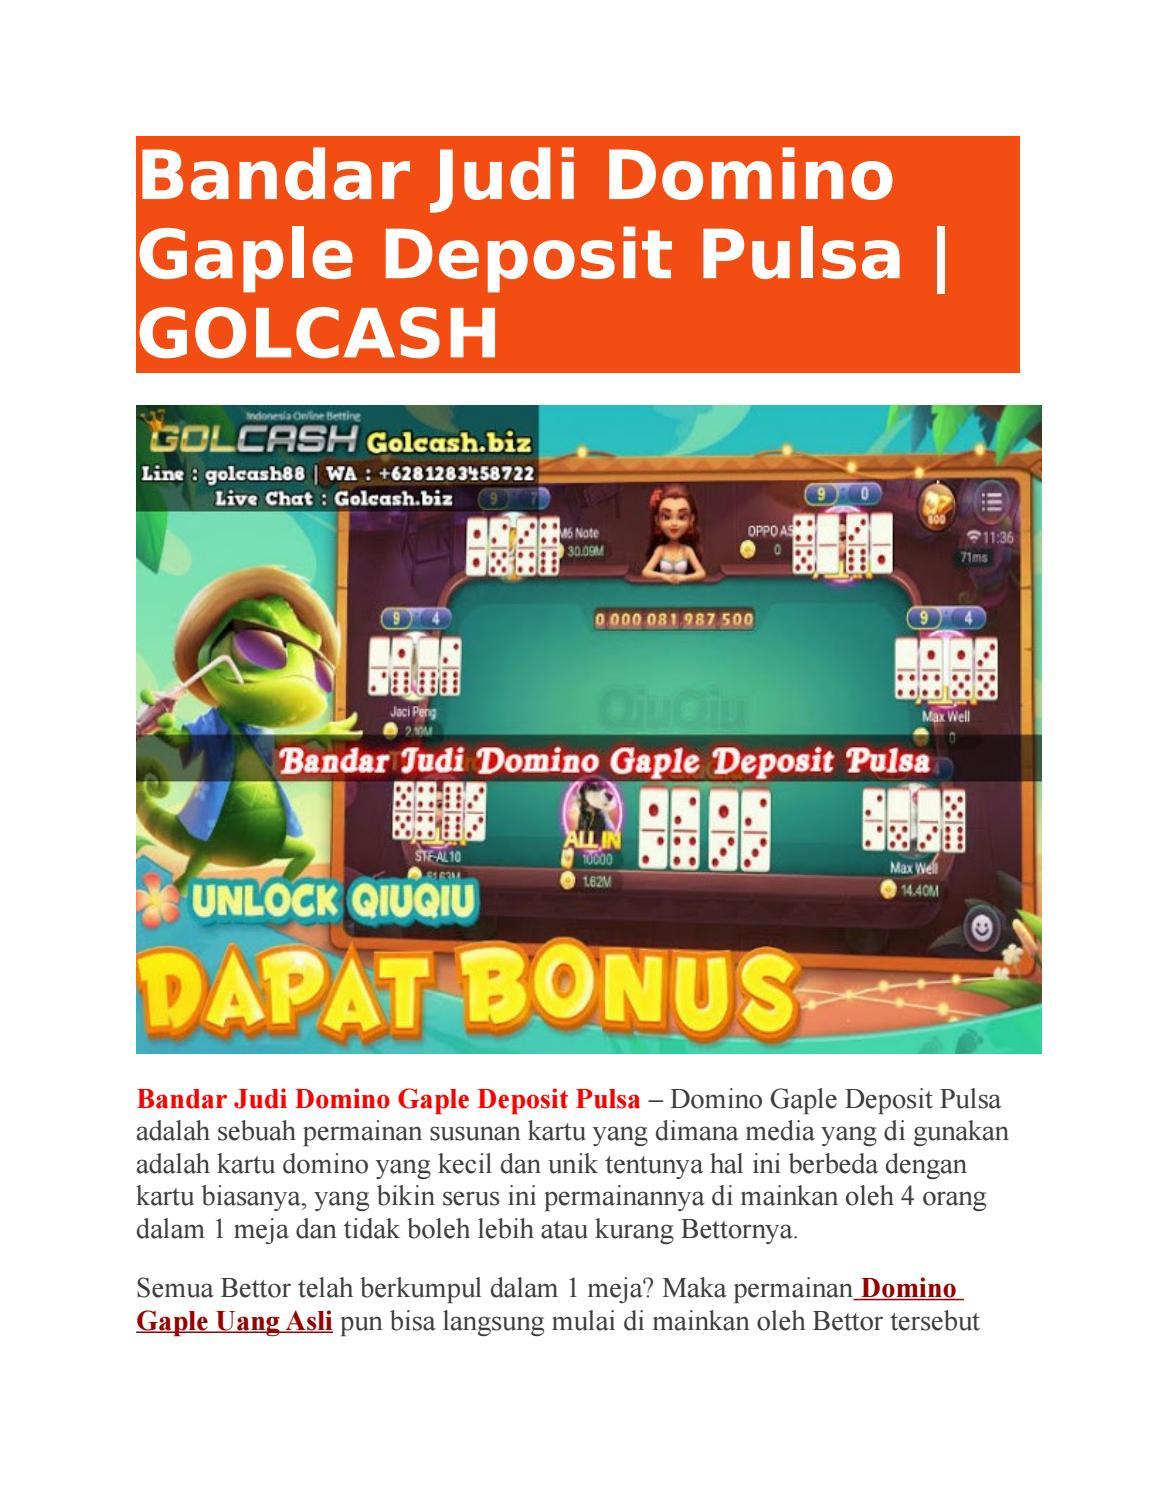 Bandar Judi Domino Gaple Deposit Pulsa Golcash By Golcash Issuu